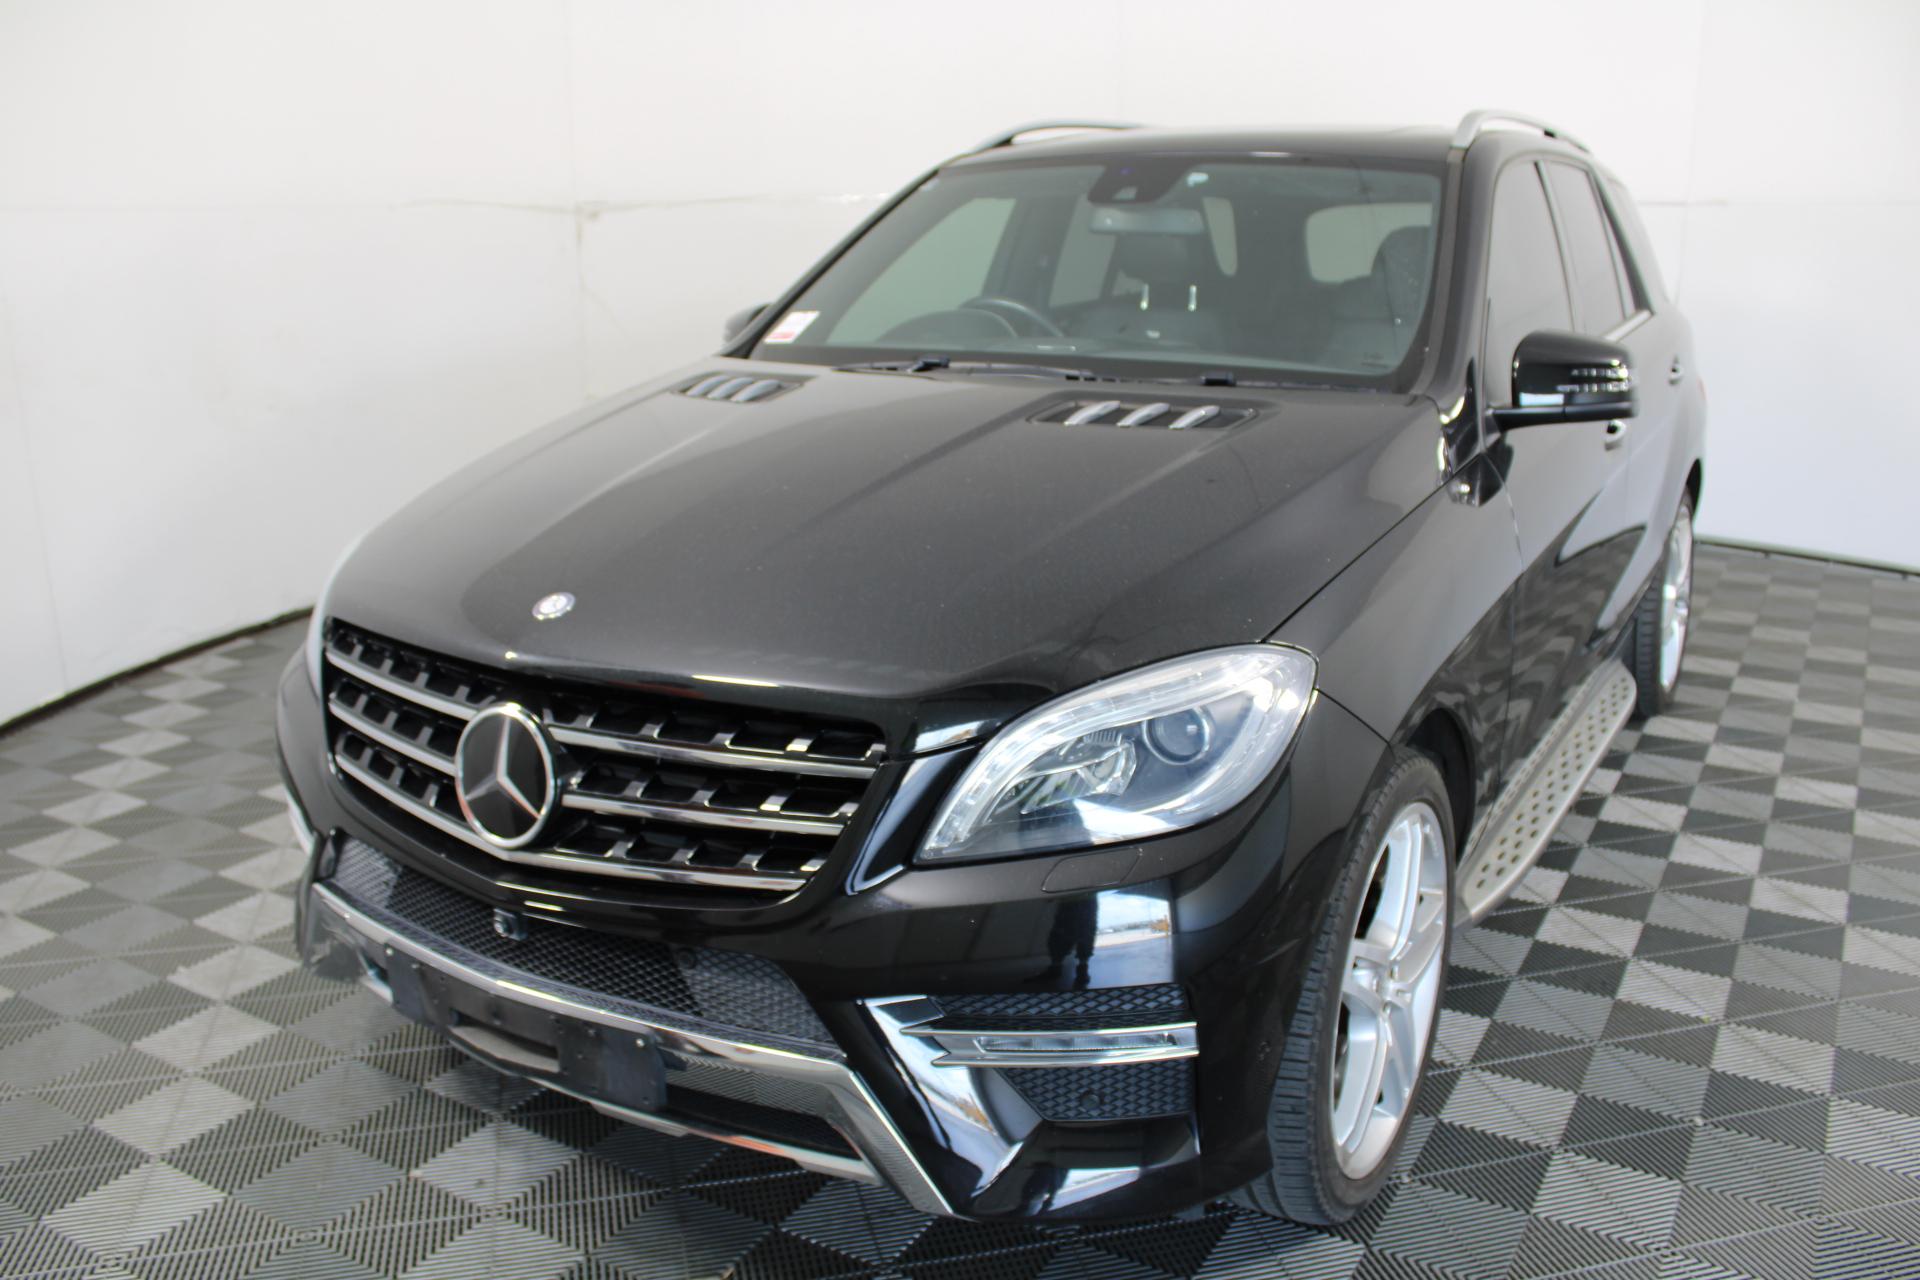 2015 Mercedes Benz ML350 BlueTEC W166 V6 T/Diesel Auto Wagon 83,972km